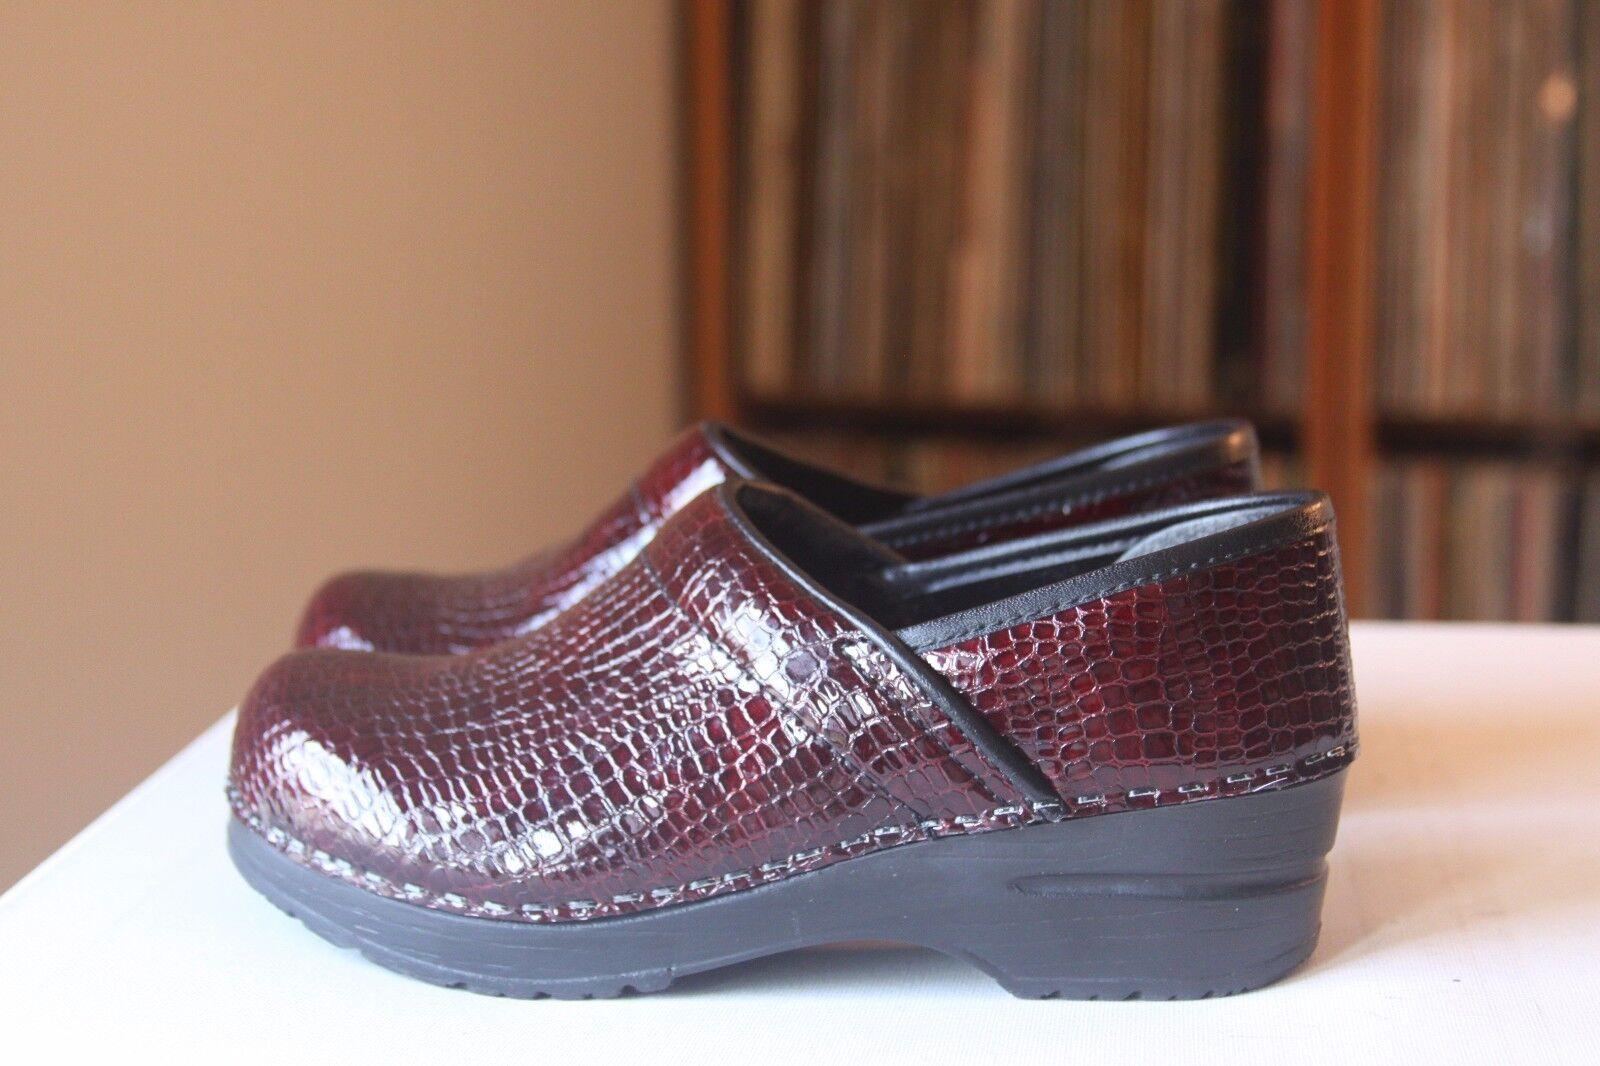 Sanita 36 Bordeaux Crocodile Embossed Patent Leather 5.5-6 Stapled Pro Clogs US 5.5-6 Leather d4646e